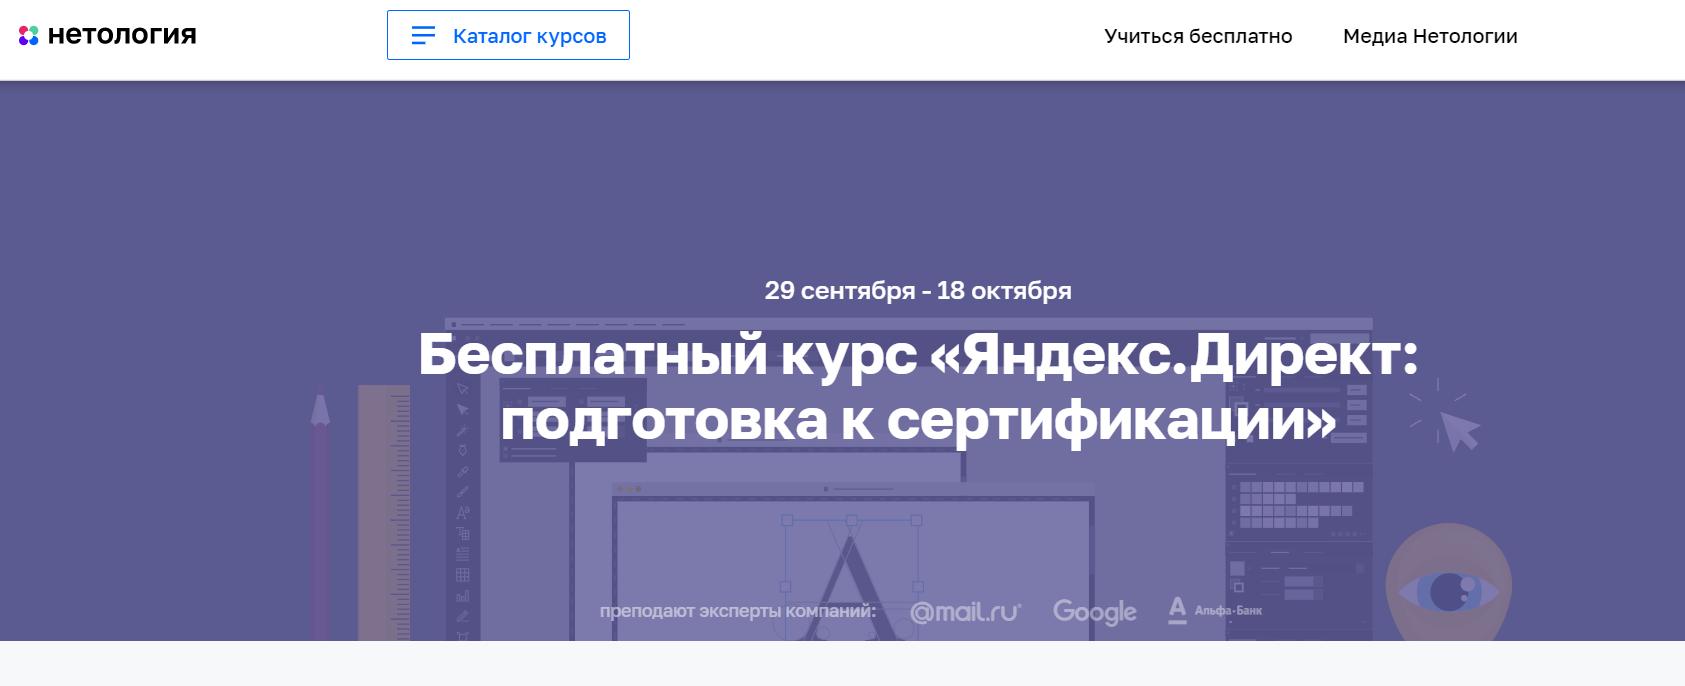 Яндекс.Директ: подготовка к сертификации